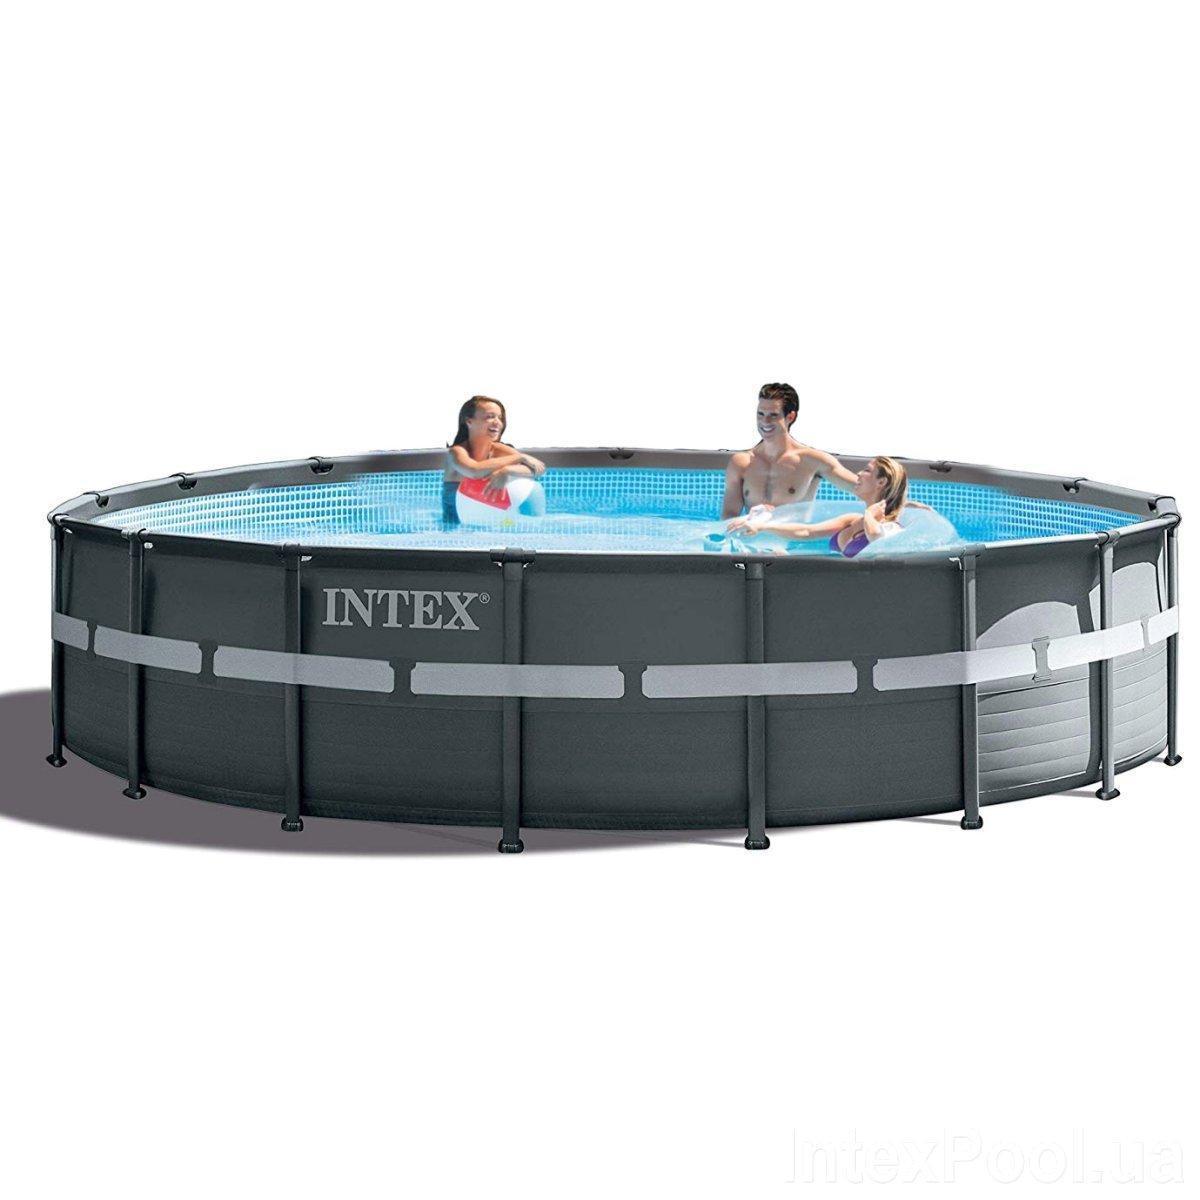 Каркасный бассейн Intex 26326-1, 488 x 122 см (лестница, тент, подстилка)